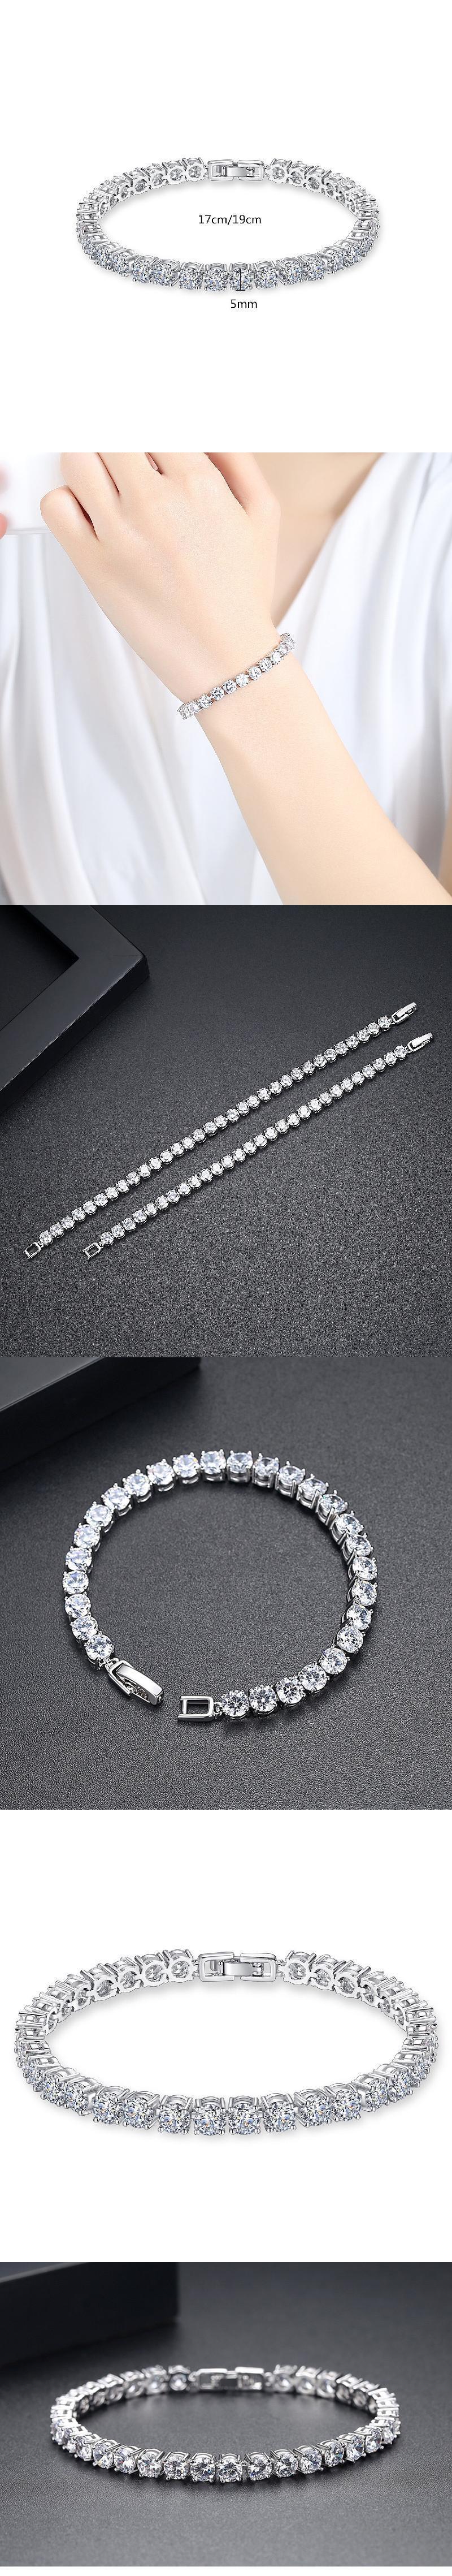 zircon tennis bracelet Gold Plated Tennis Bracelet jewelry set